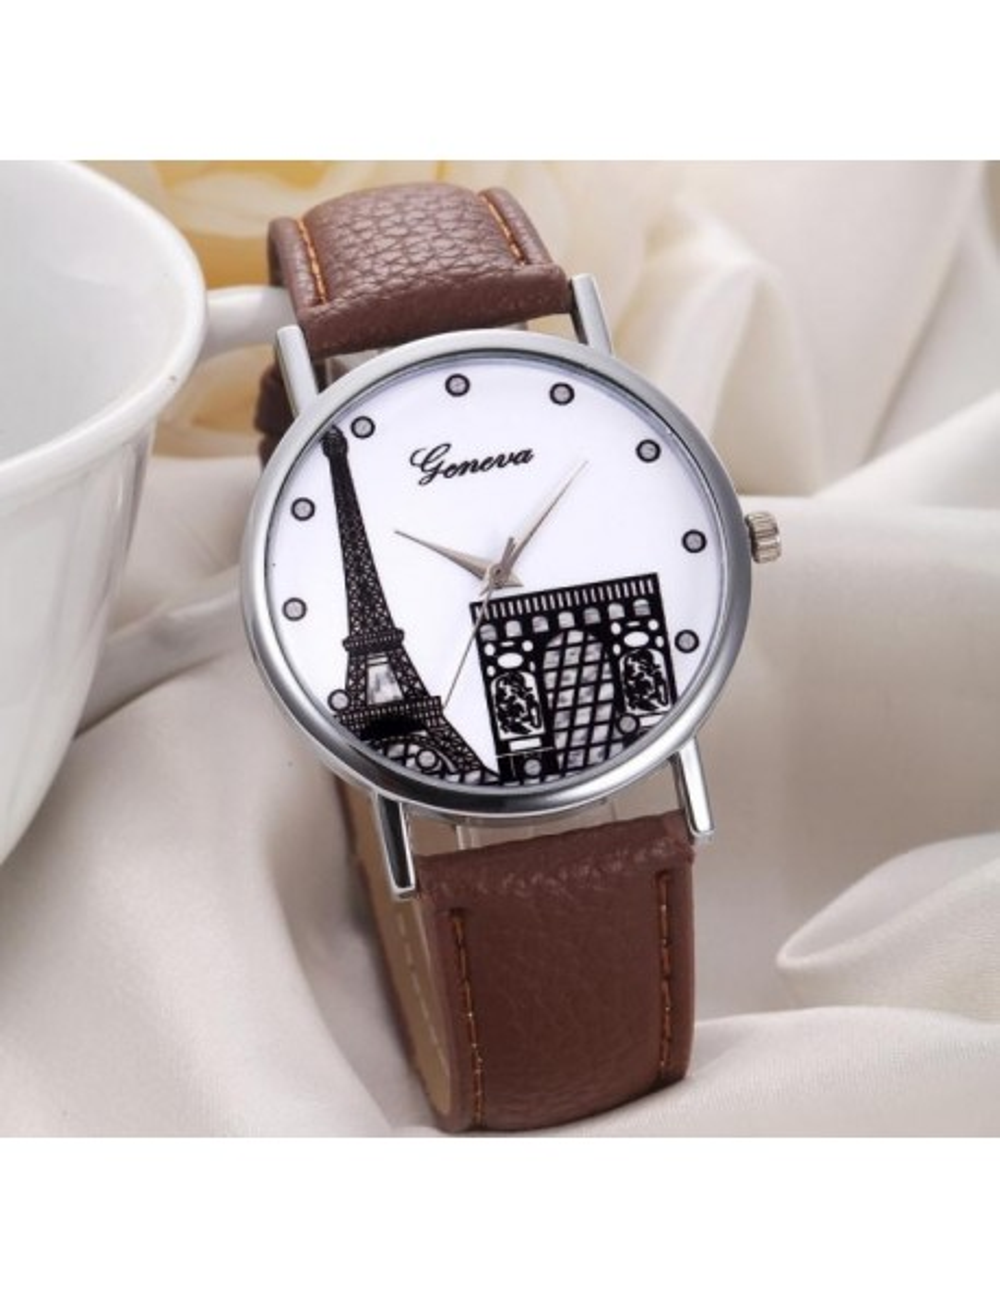 Reloj Geneva Paris Arco del triunfo